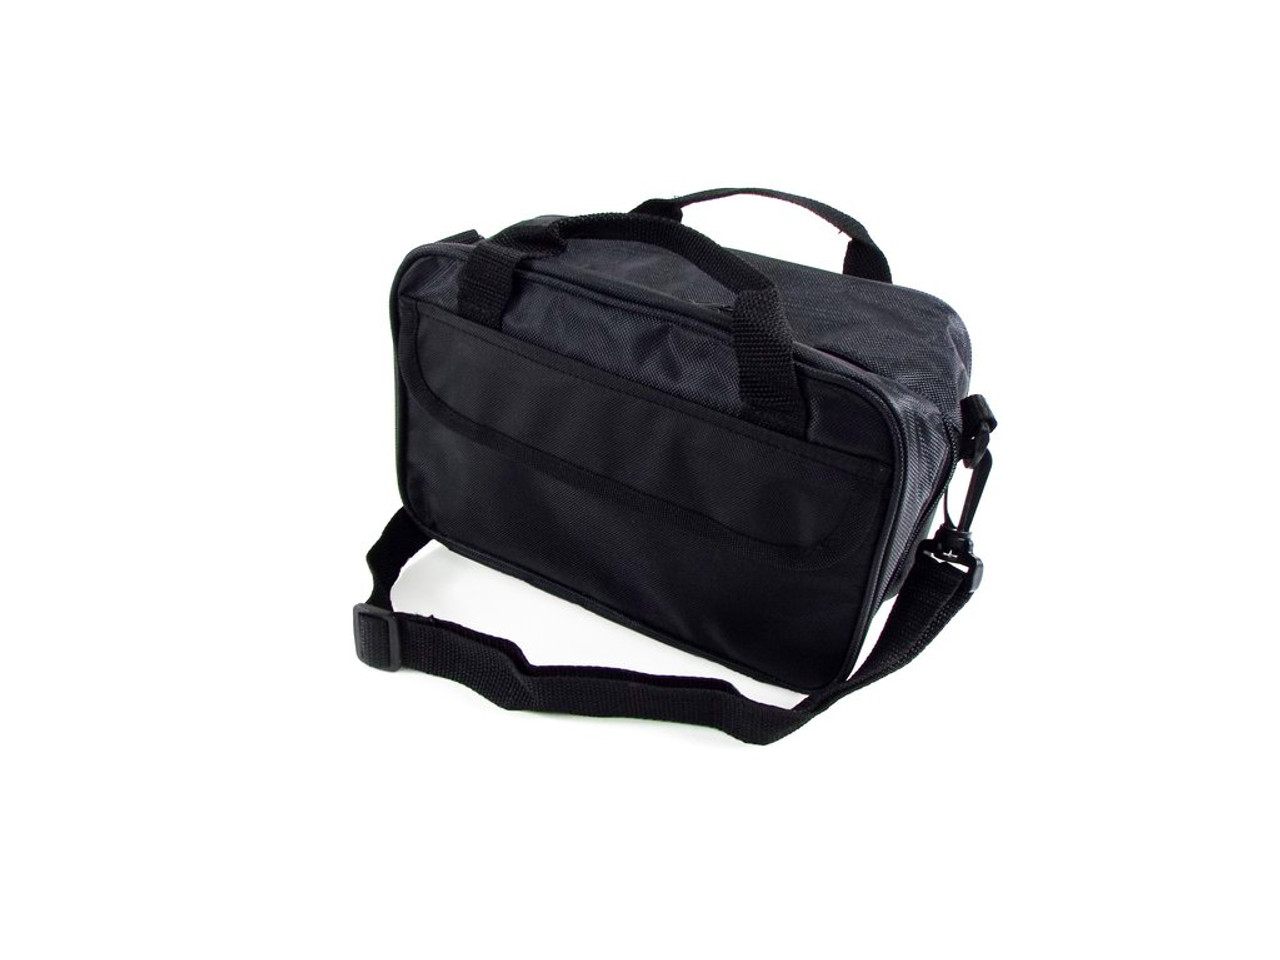 Pocket Box Bag 5x7